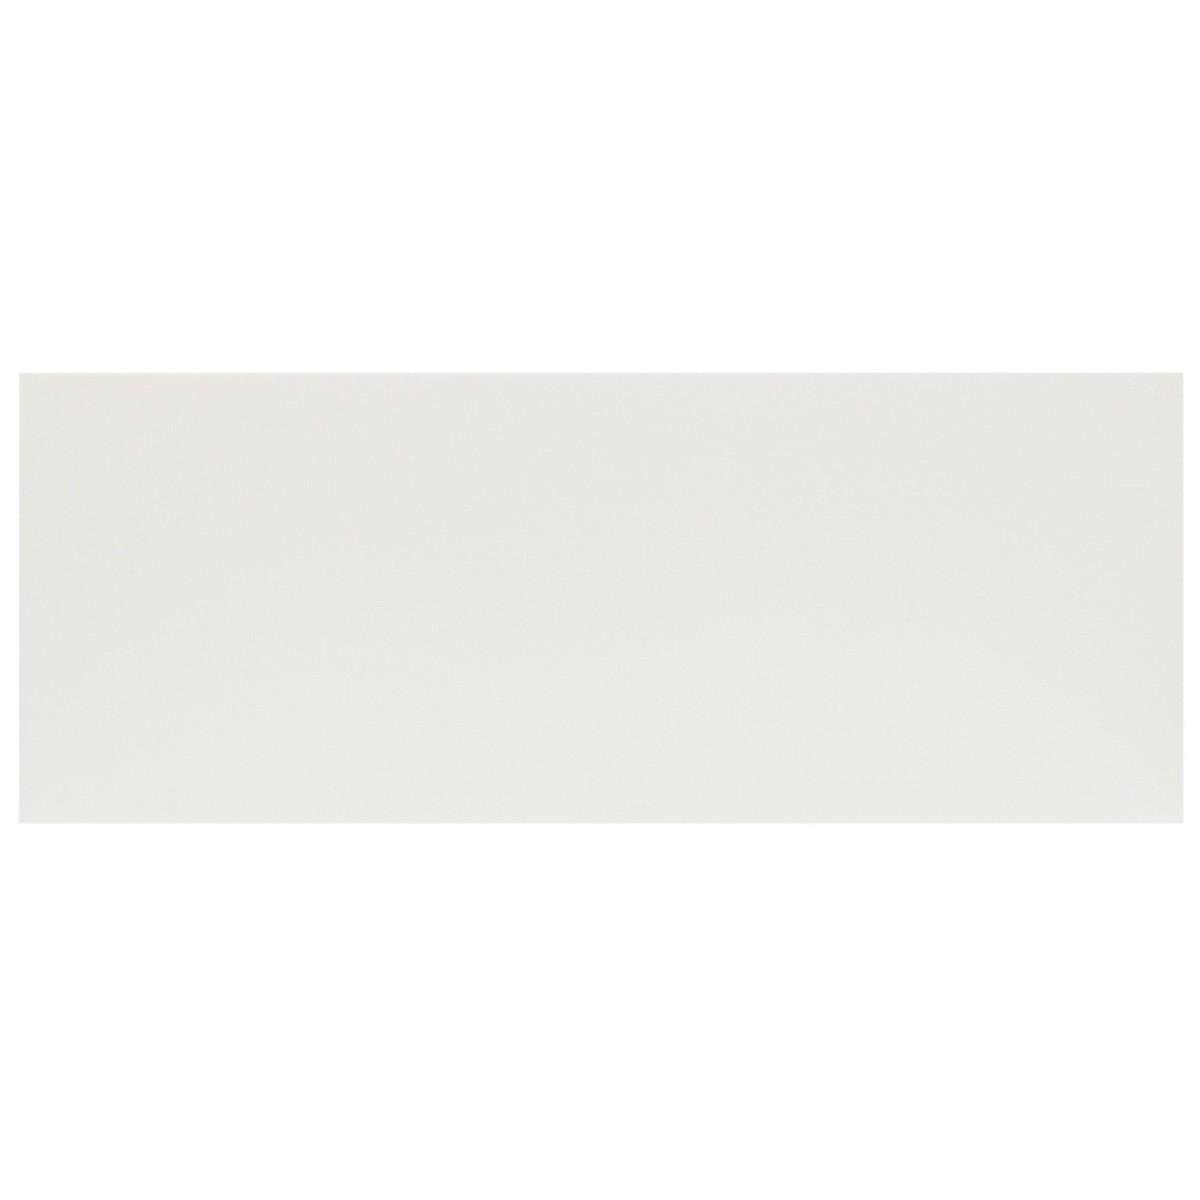 Плитка настенная Пленэр 20х50 см 1.2 м2 цвет белый